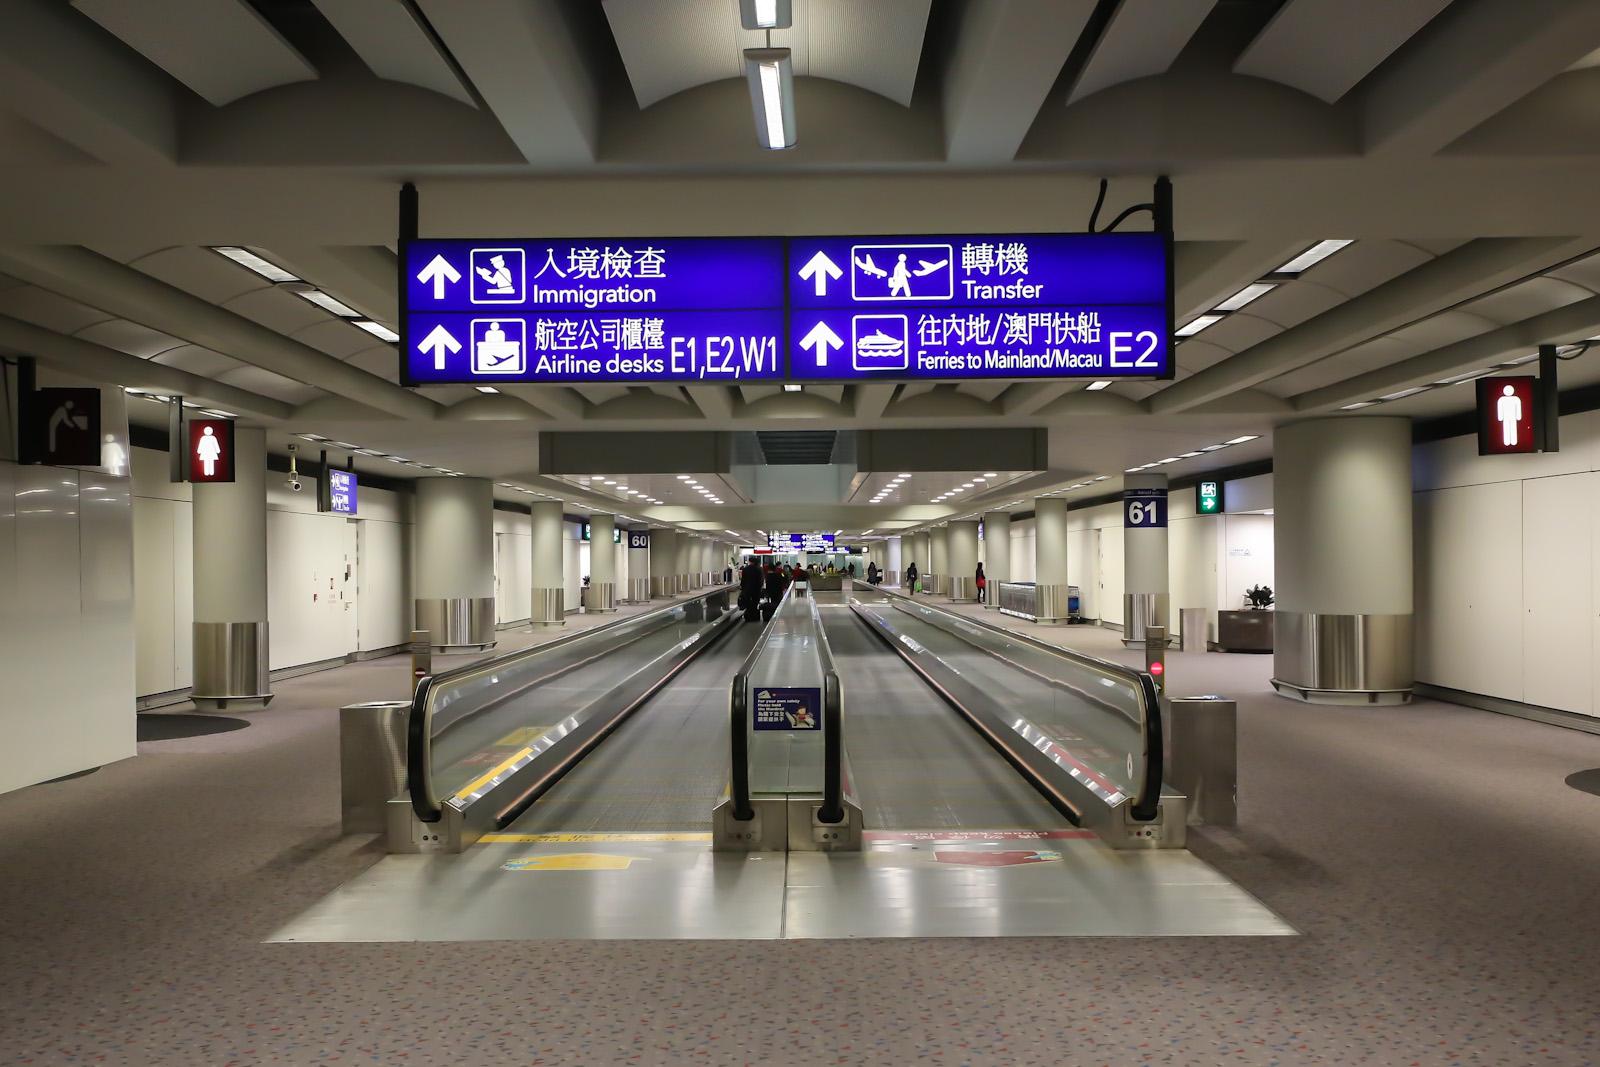 Коридоры аэропорта Гонконга